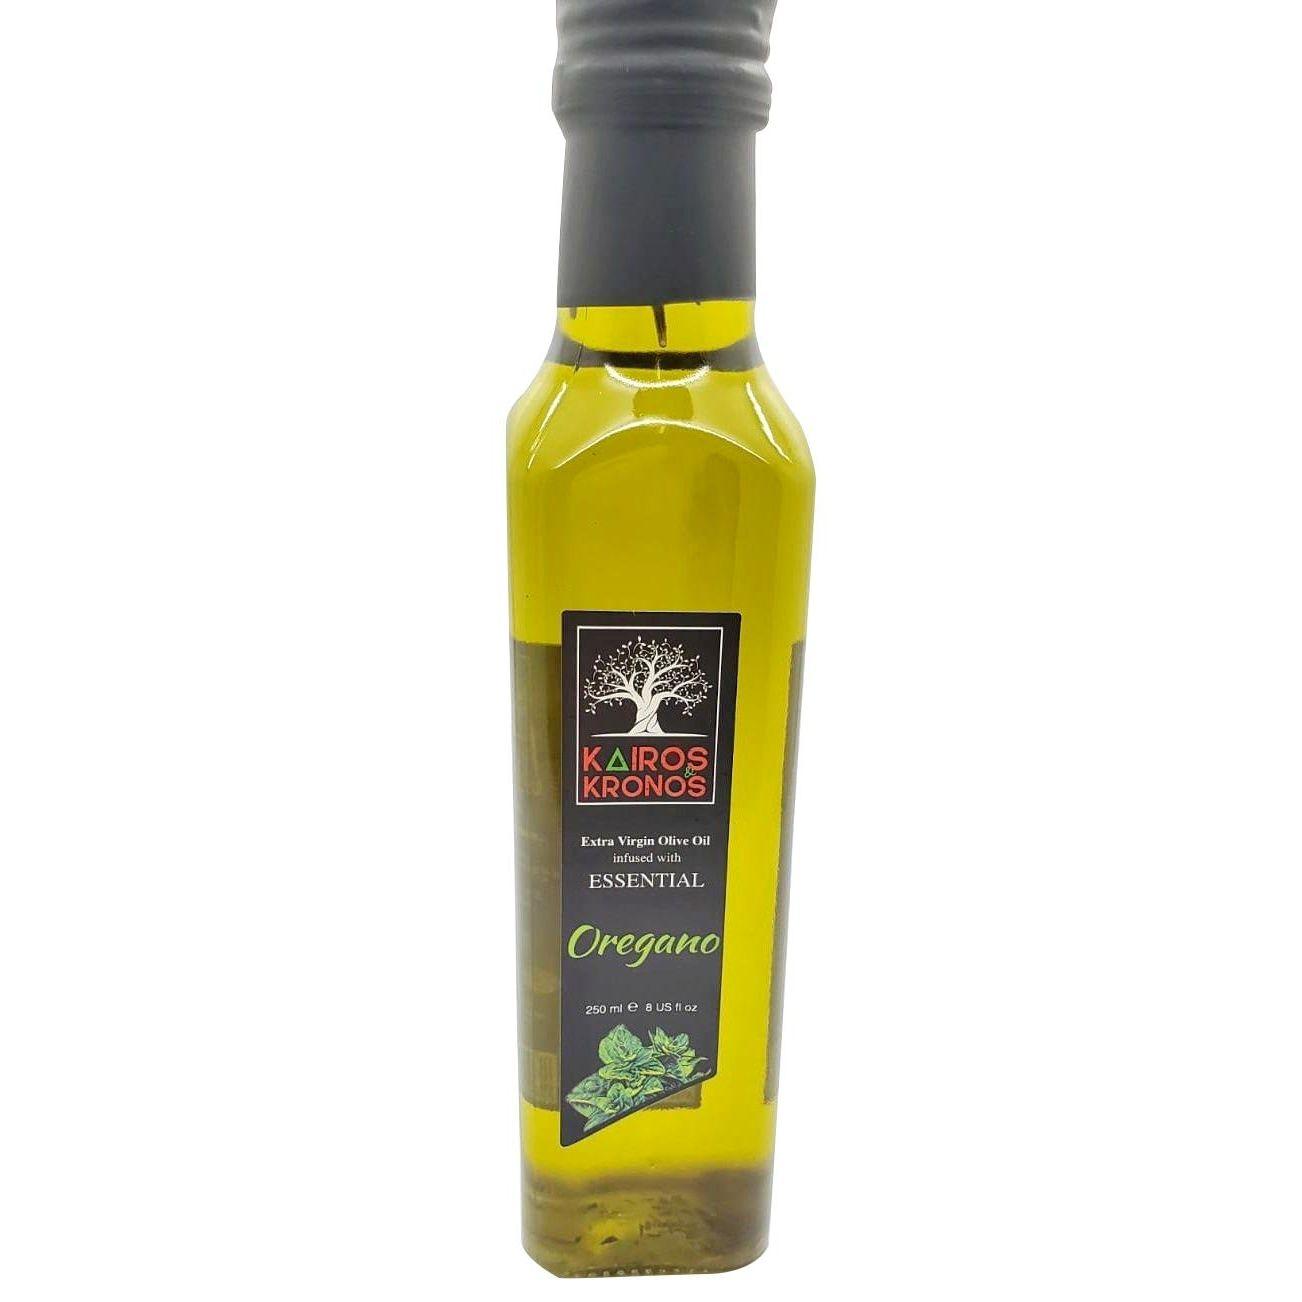 GroceryandMeat.com:Kairos Kronos Oregano Olive Oil 250ml